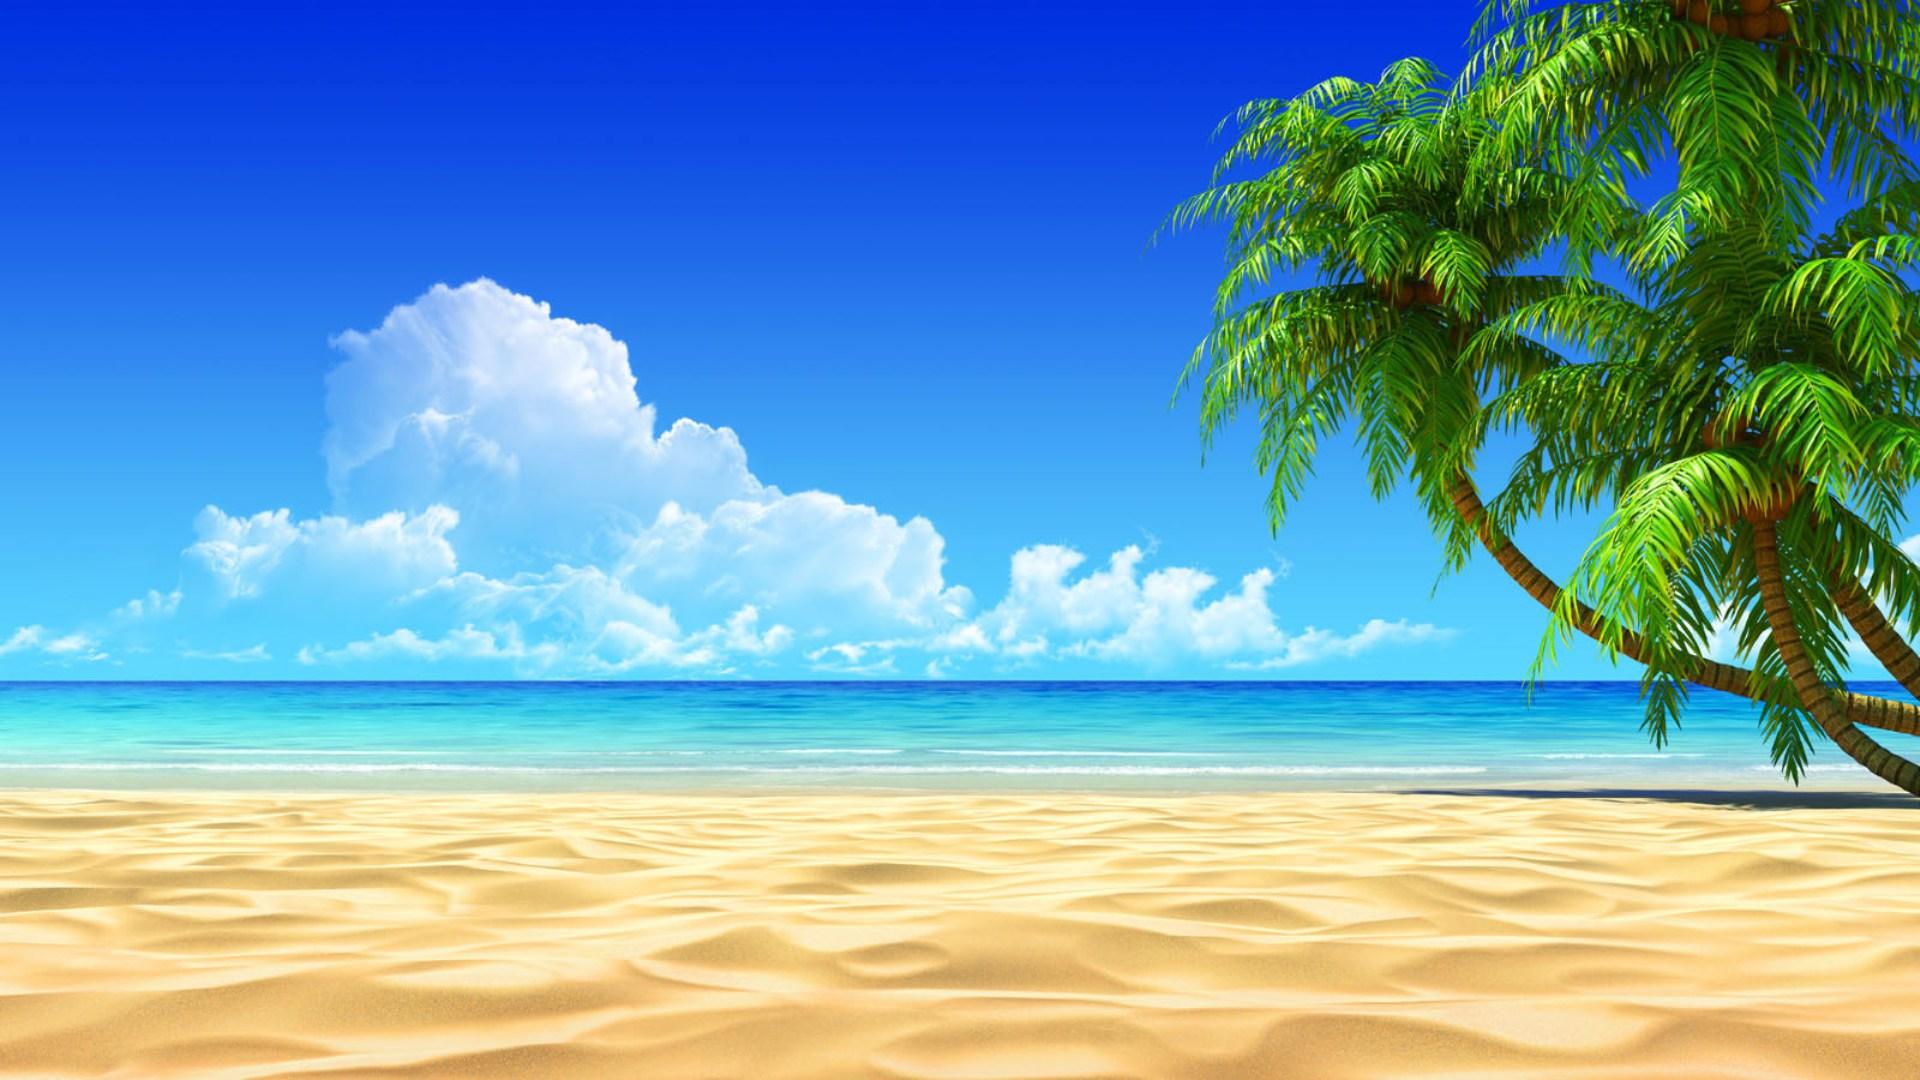 Beach Wallpaper Design Ideas French Blue Ipad Hd 1920x1080px 1920x1080